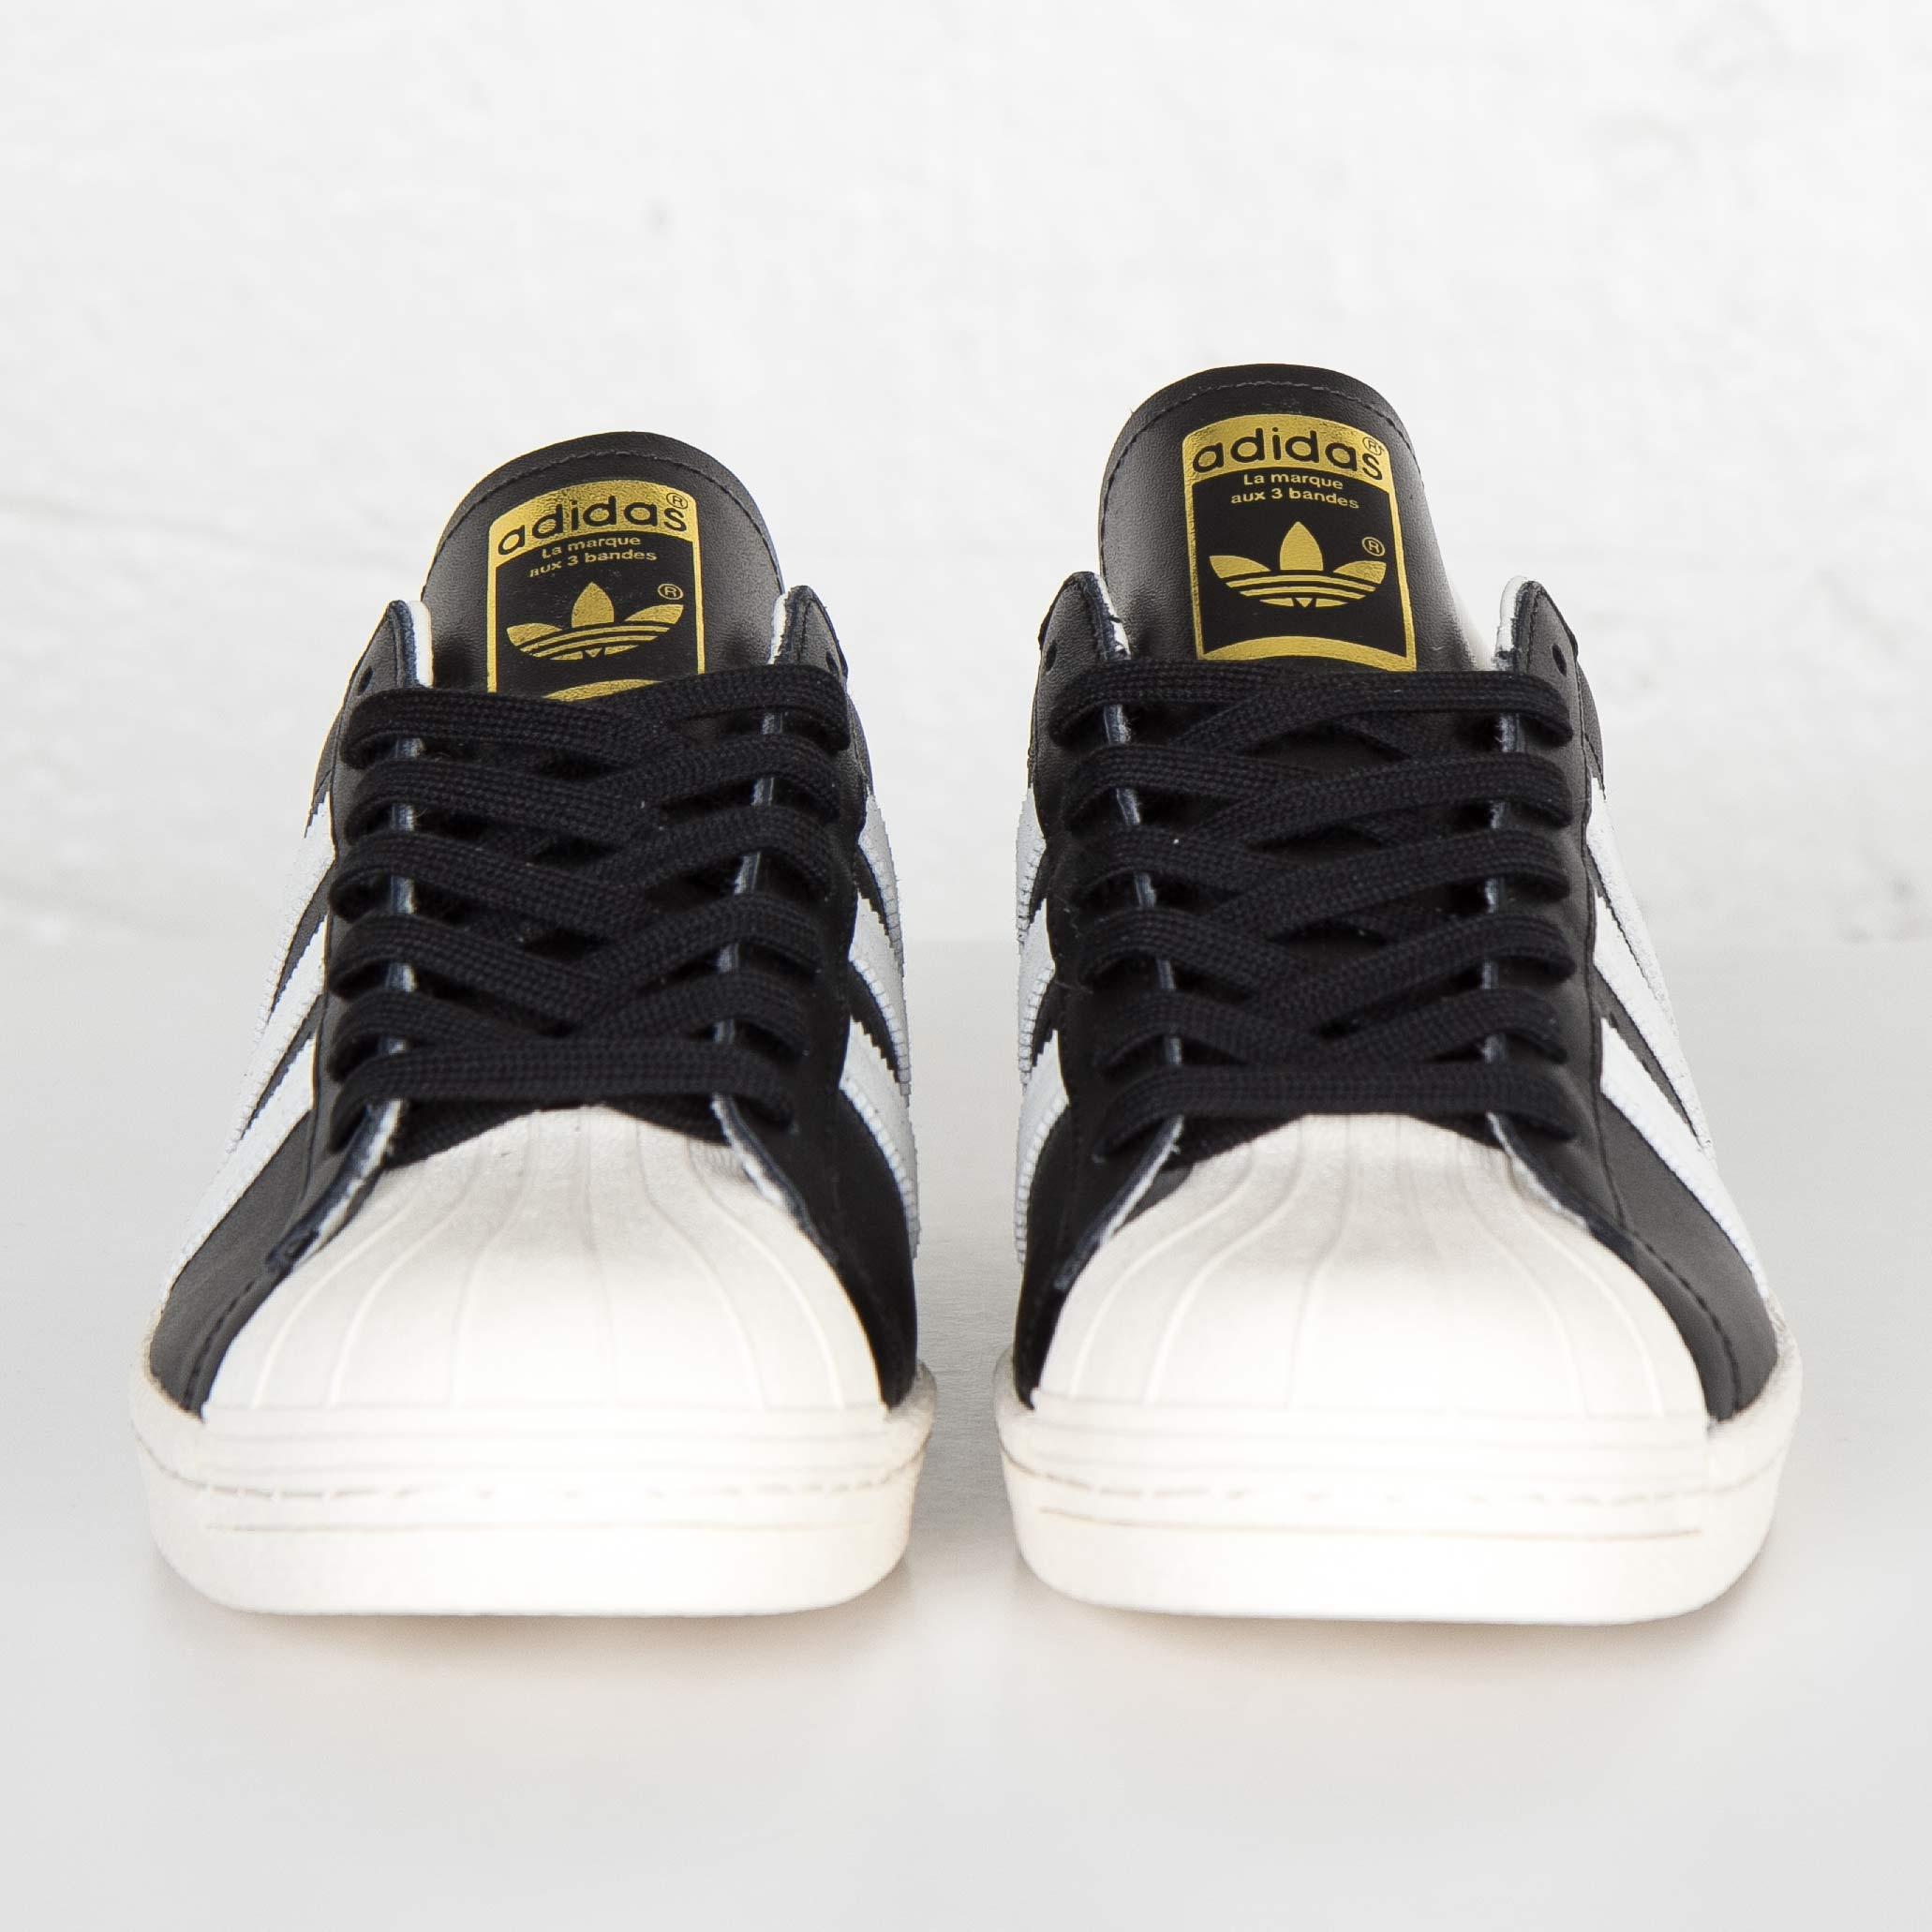 adidas superstar g61069